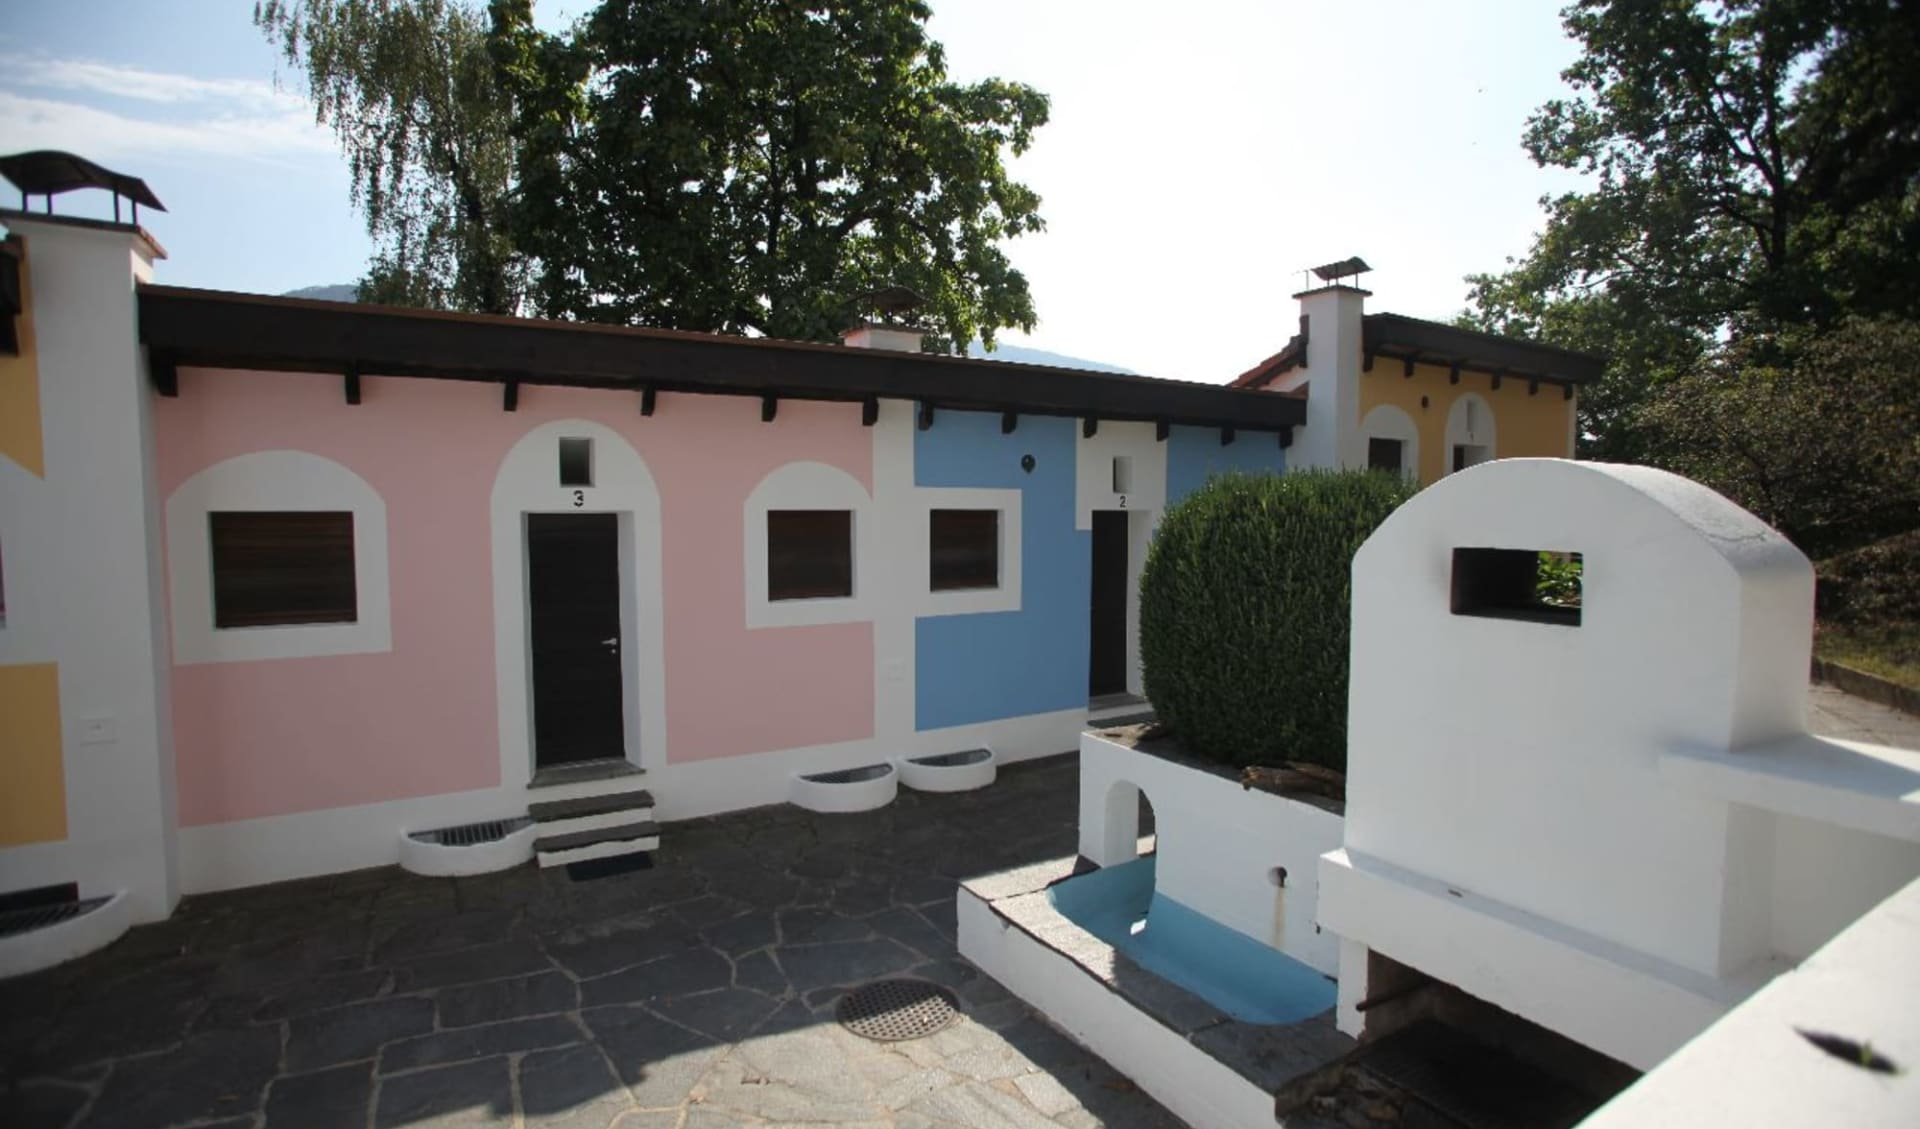 Sessa - Hotel i Grappoli: Bungalow i Grappoli